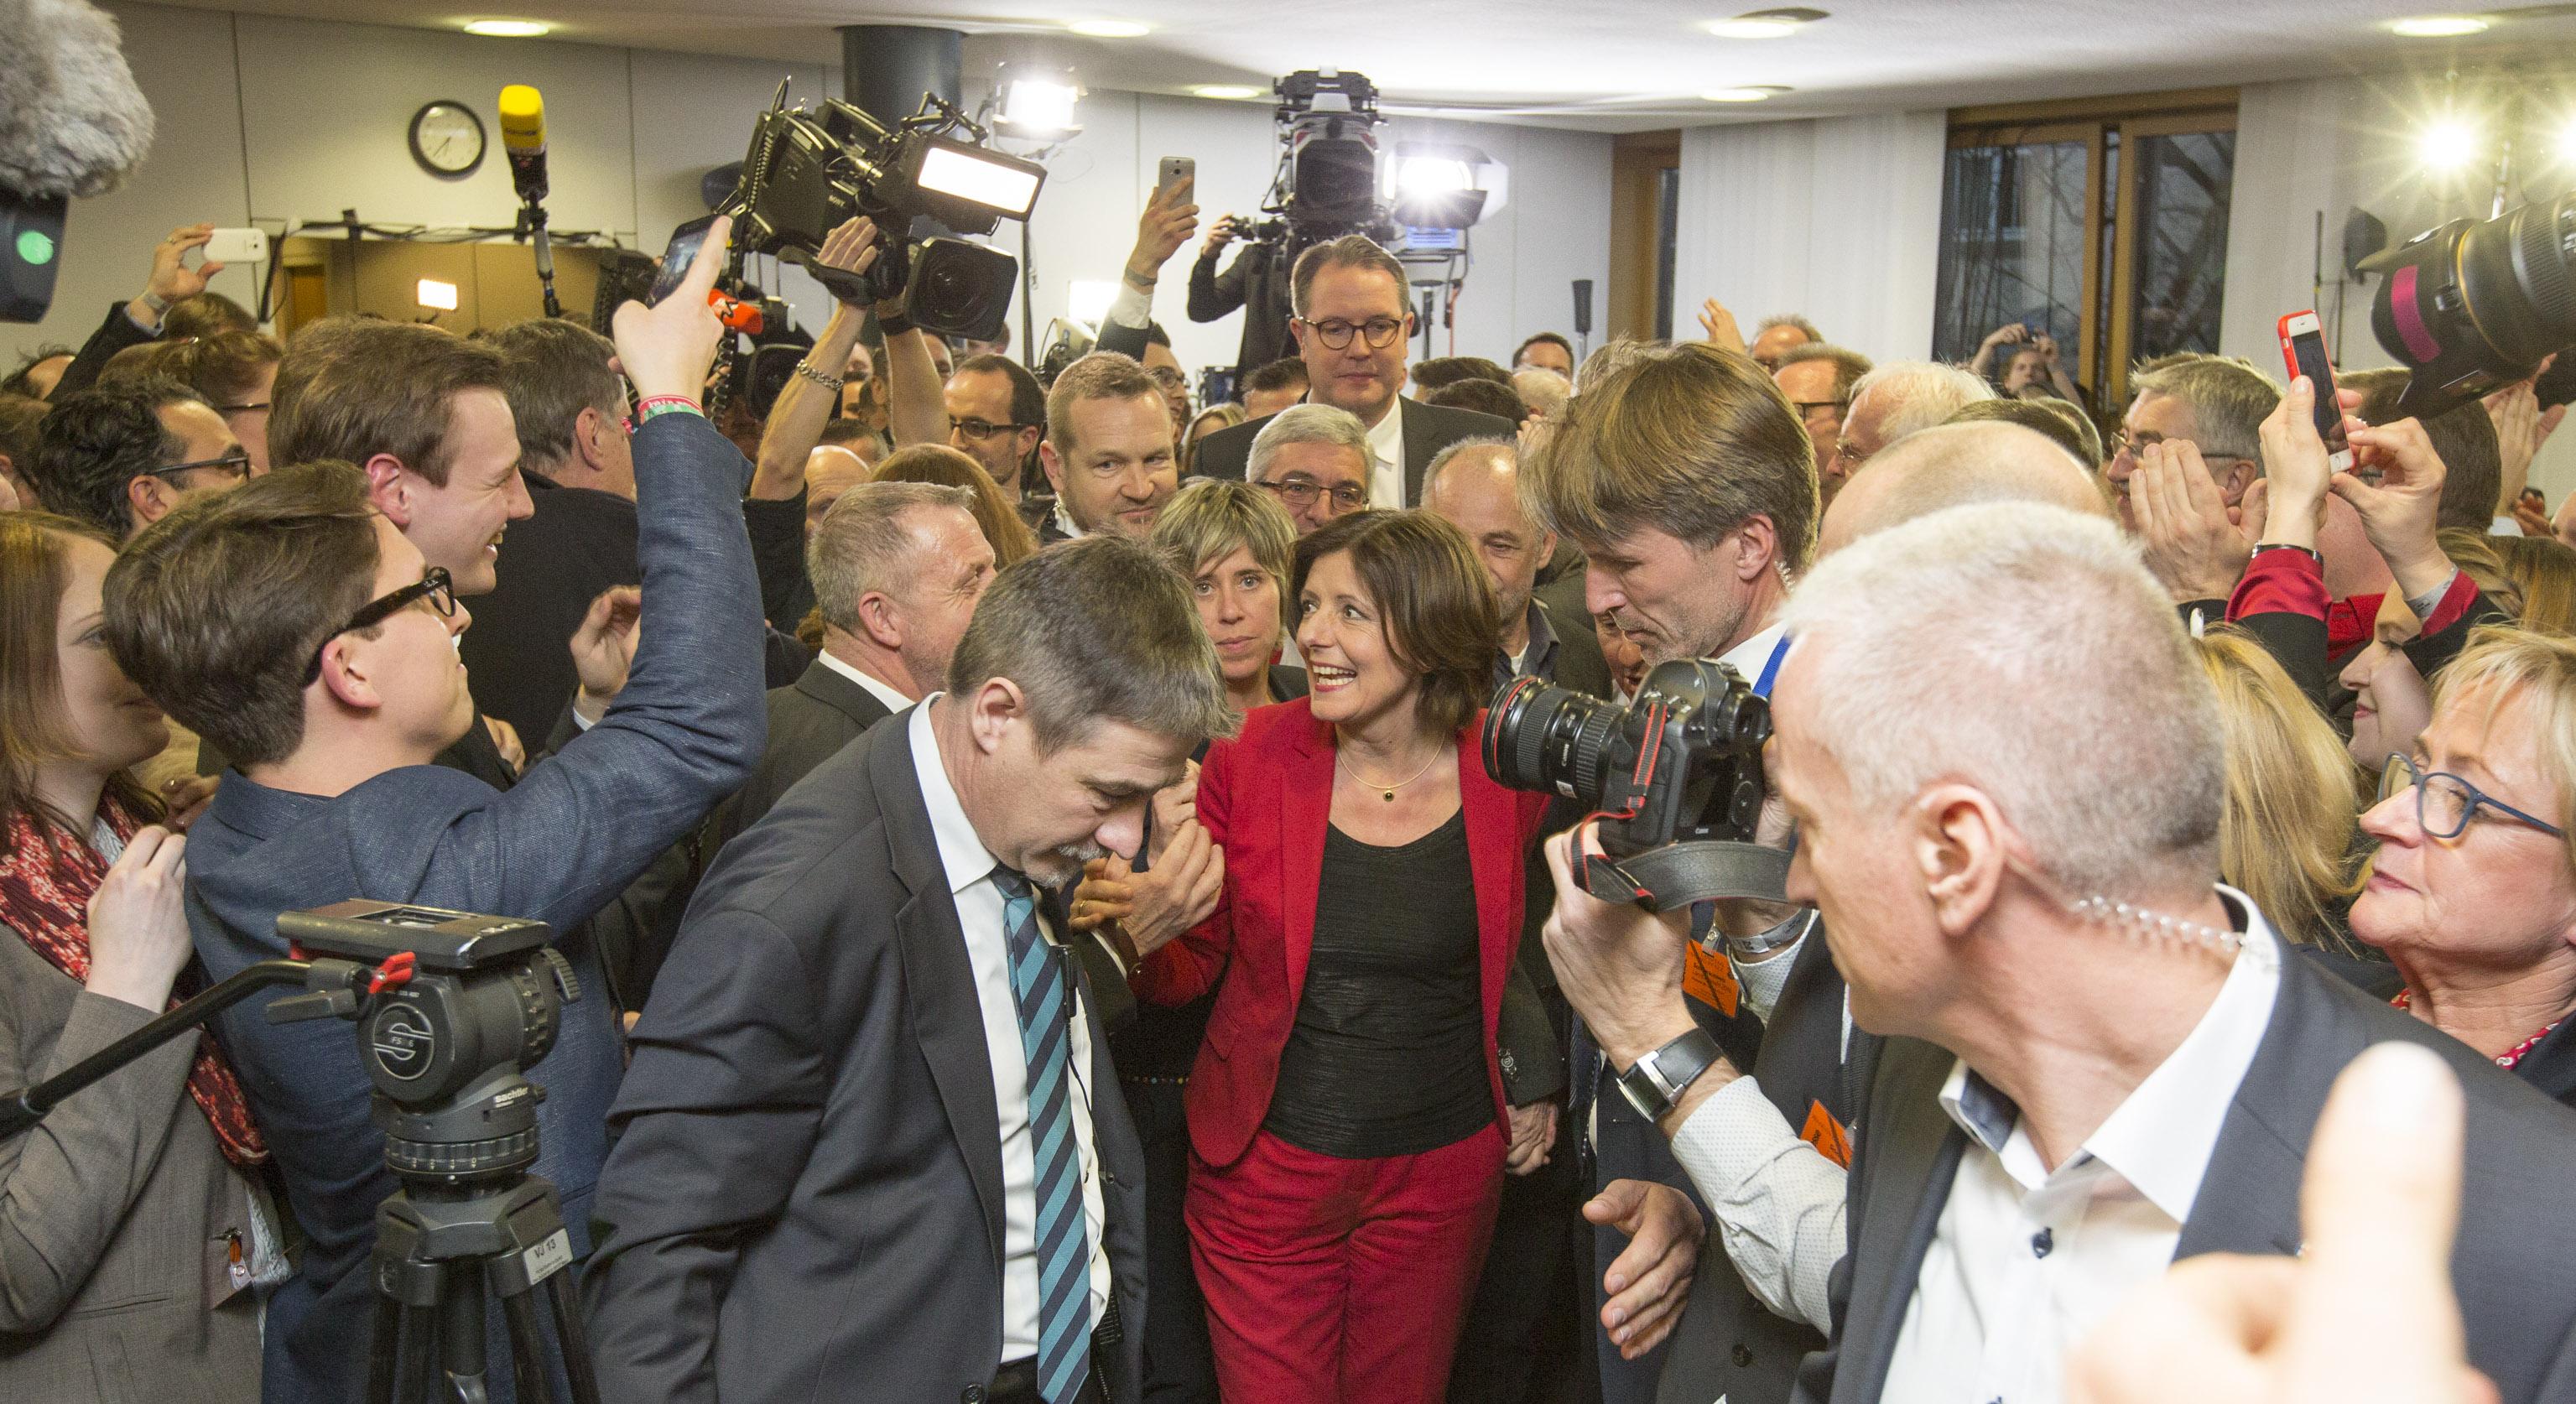 SPD-Wahlsieg feiert Geburtstag